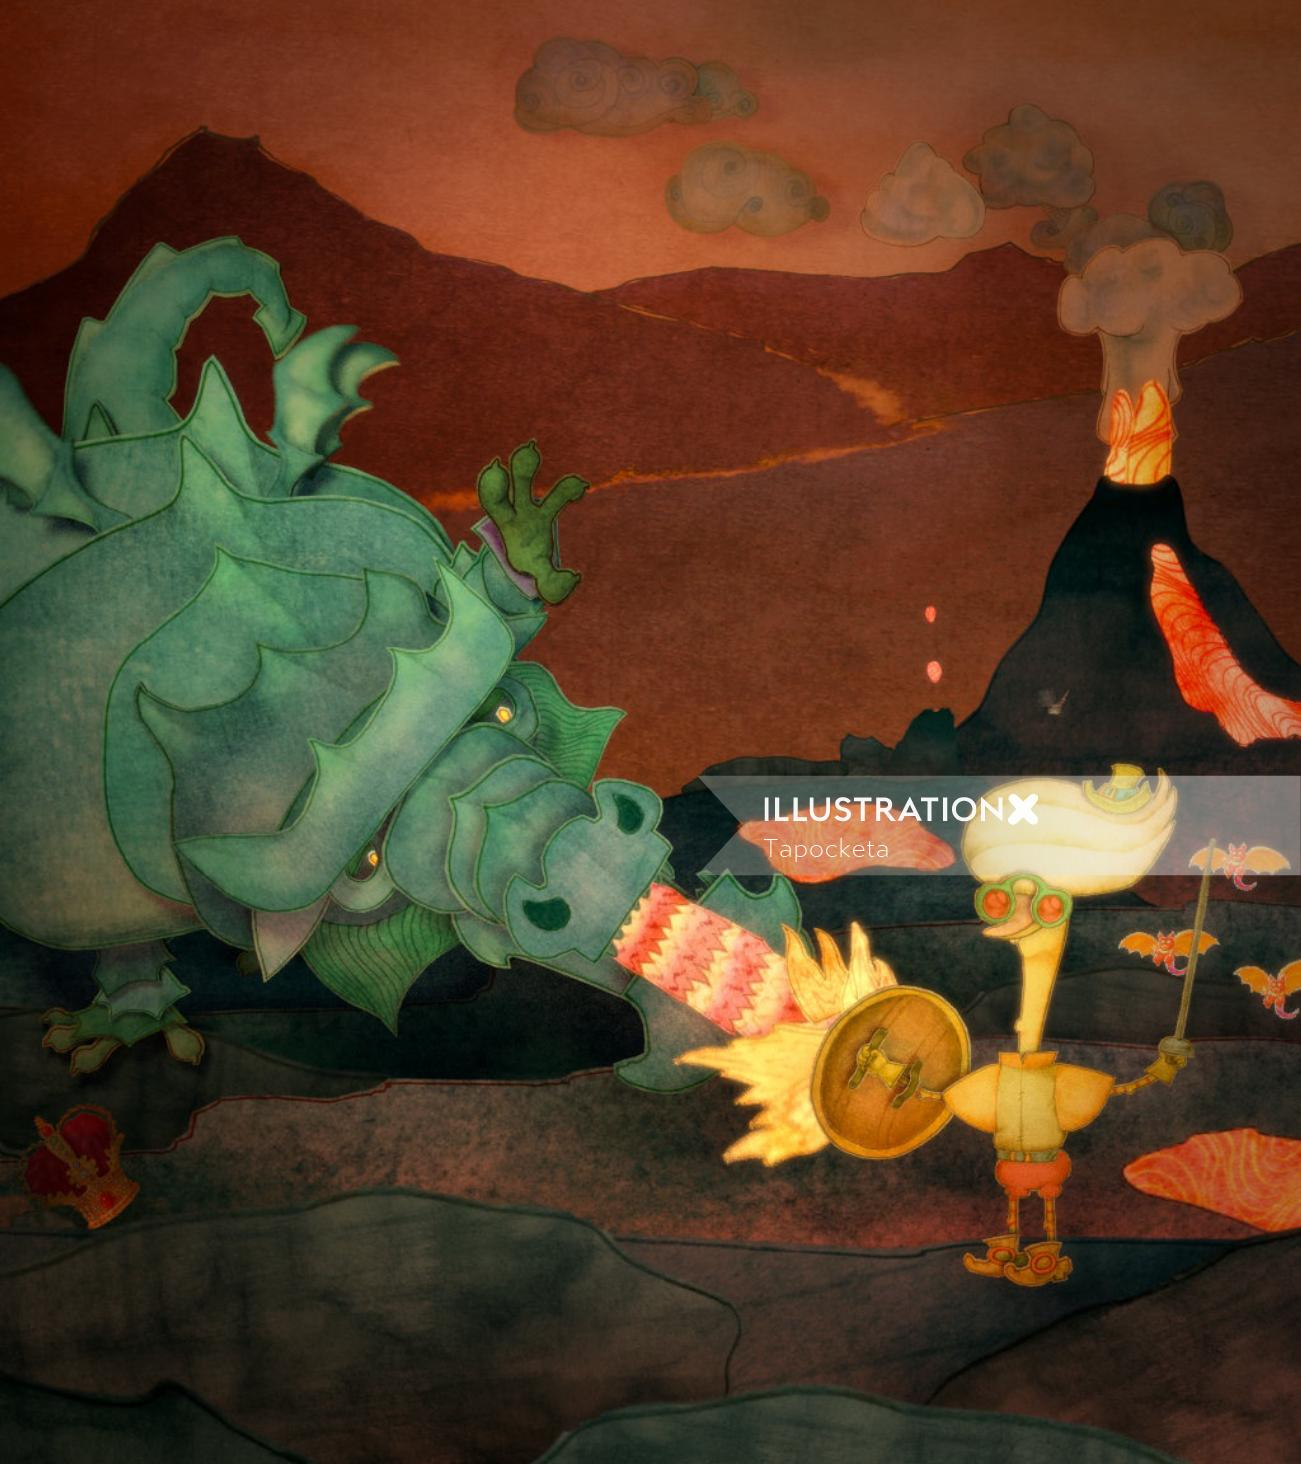 Dandy and the Dragon cartoon illustration